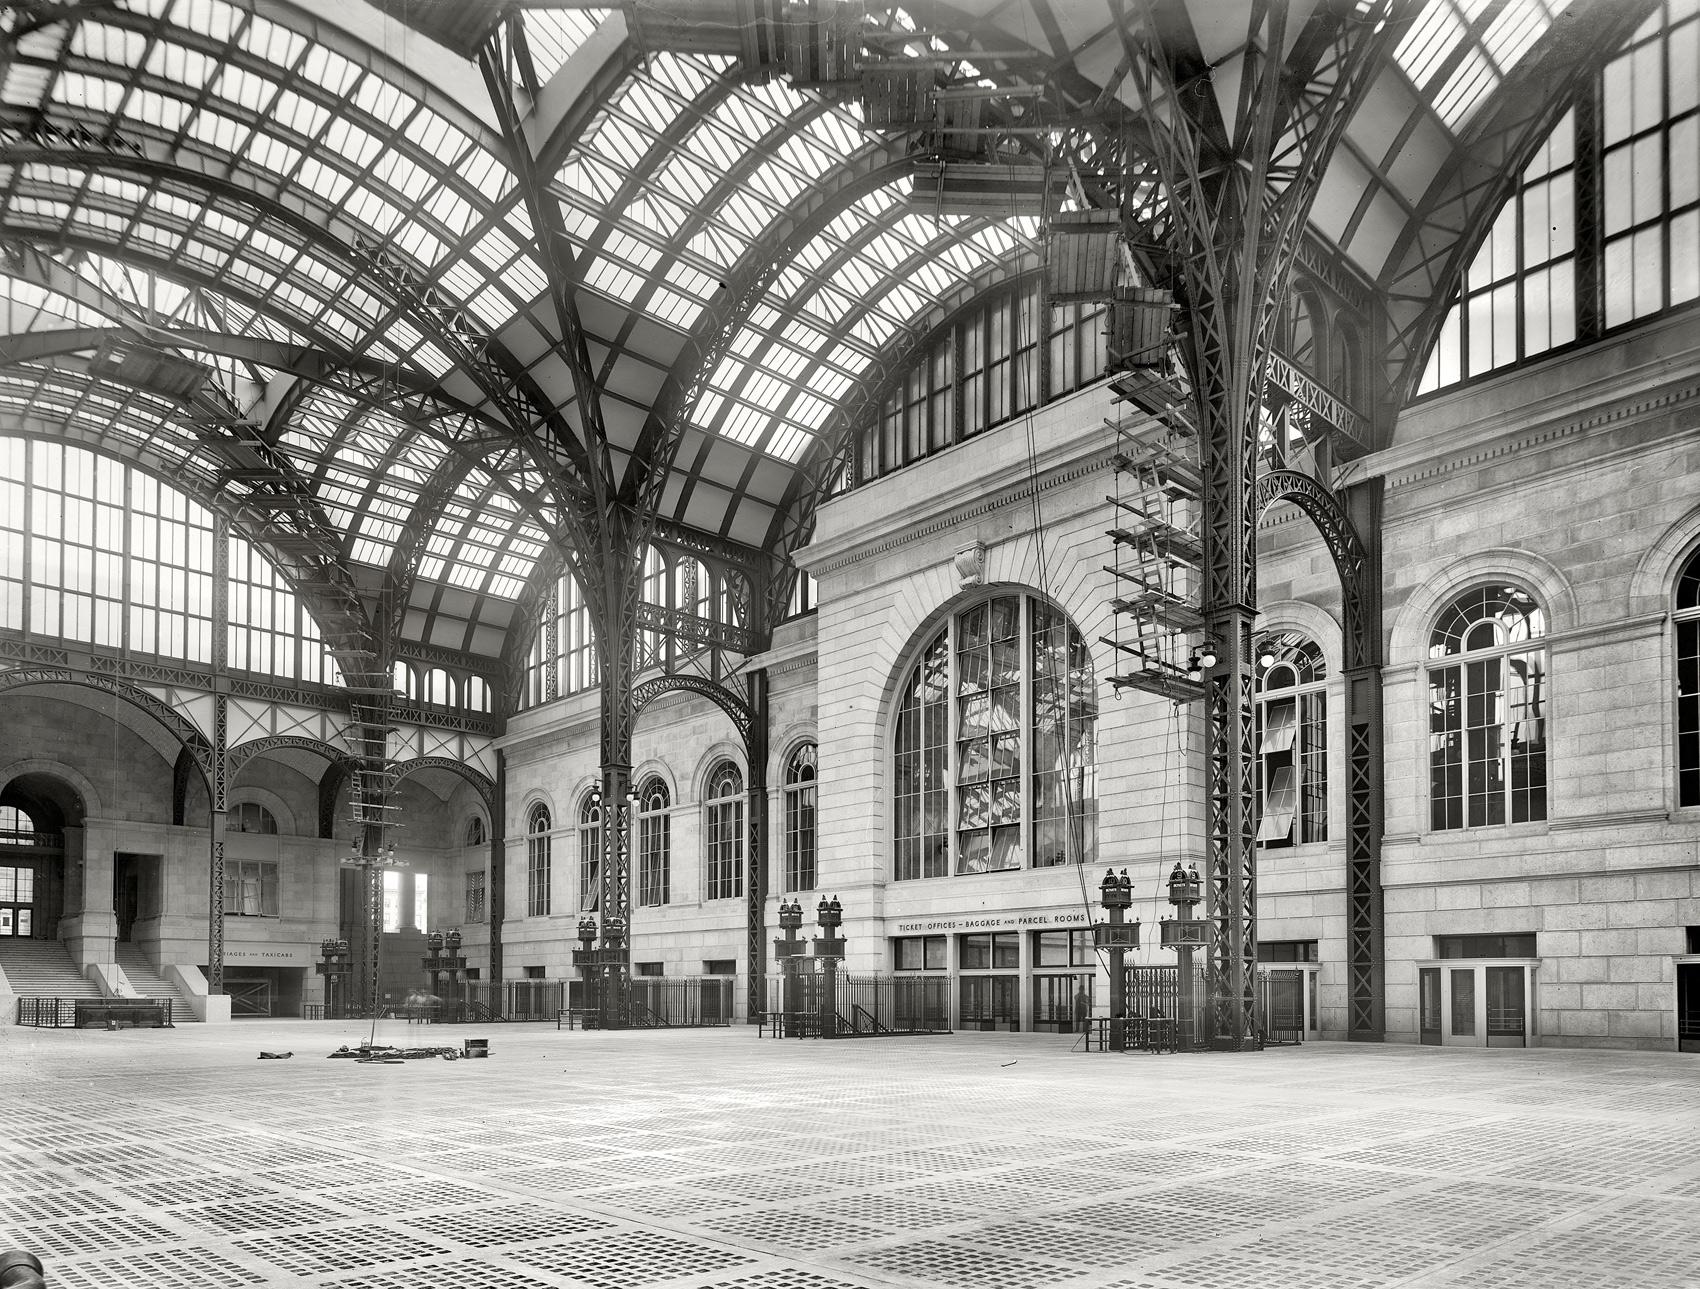 A History Of Pennsylvania Station